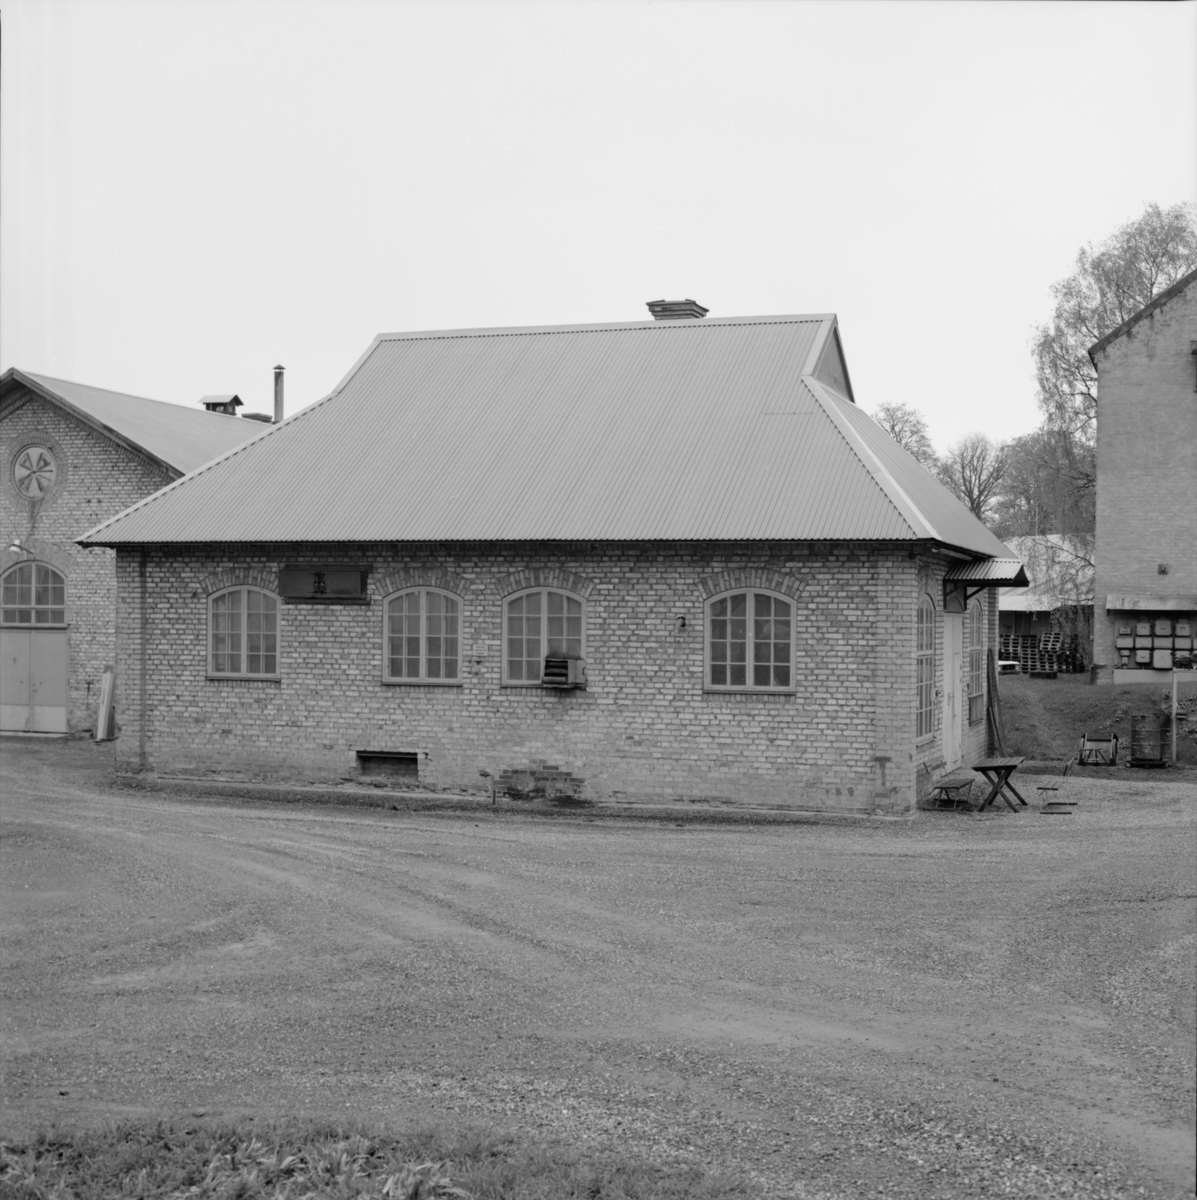 Industribyggnad, Dannemora Gruvor AB, Dannemora, Uppland maj 1991